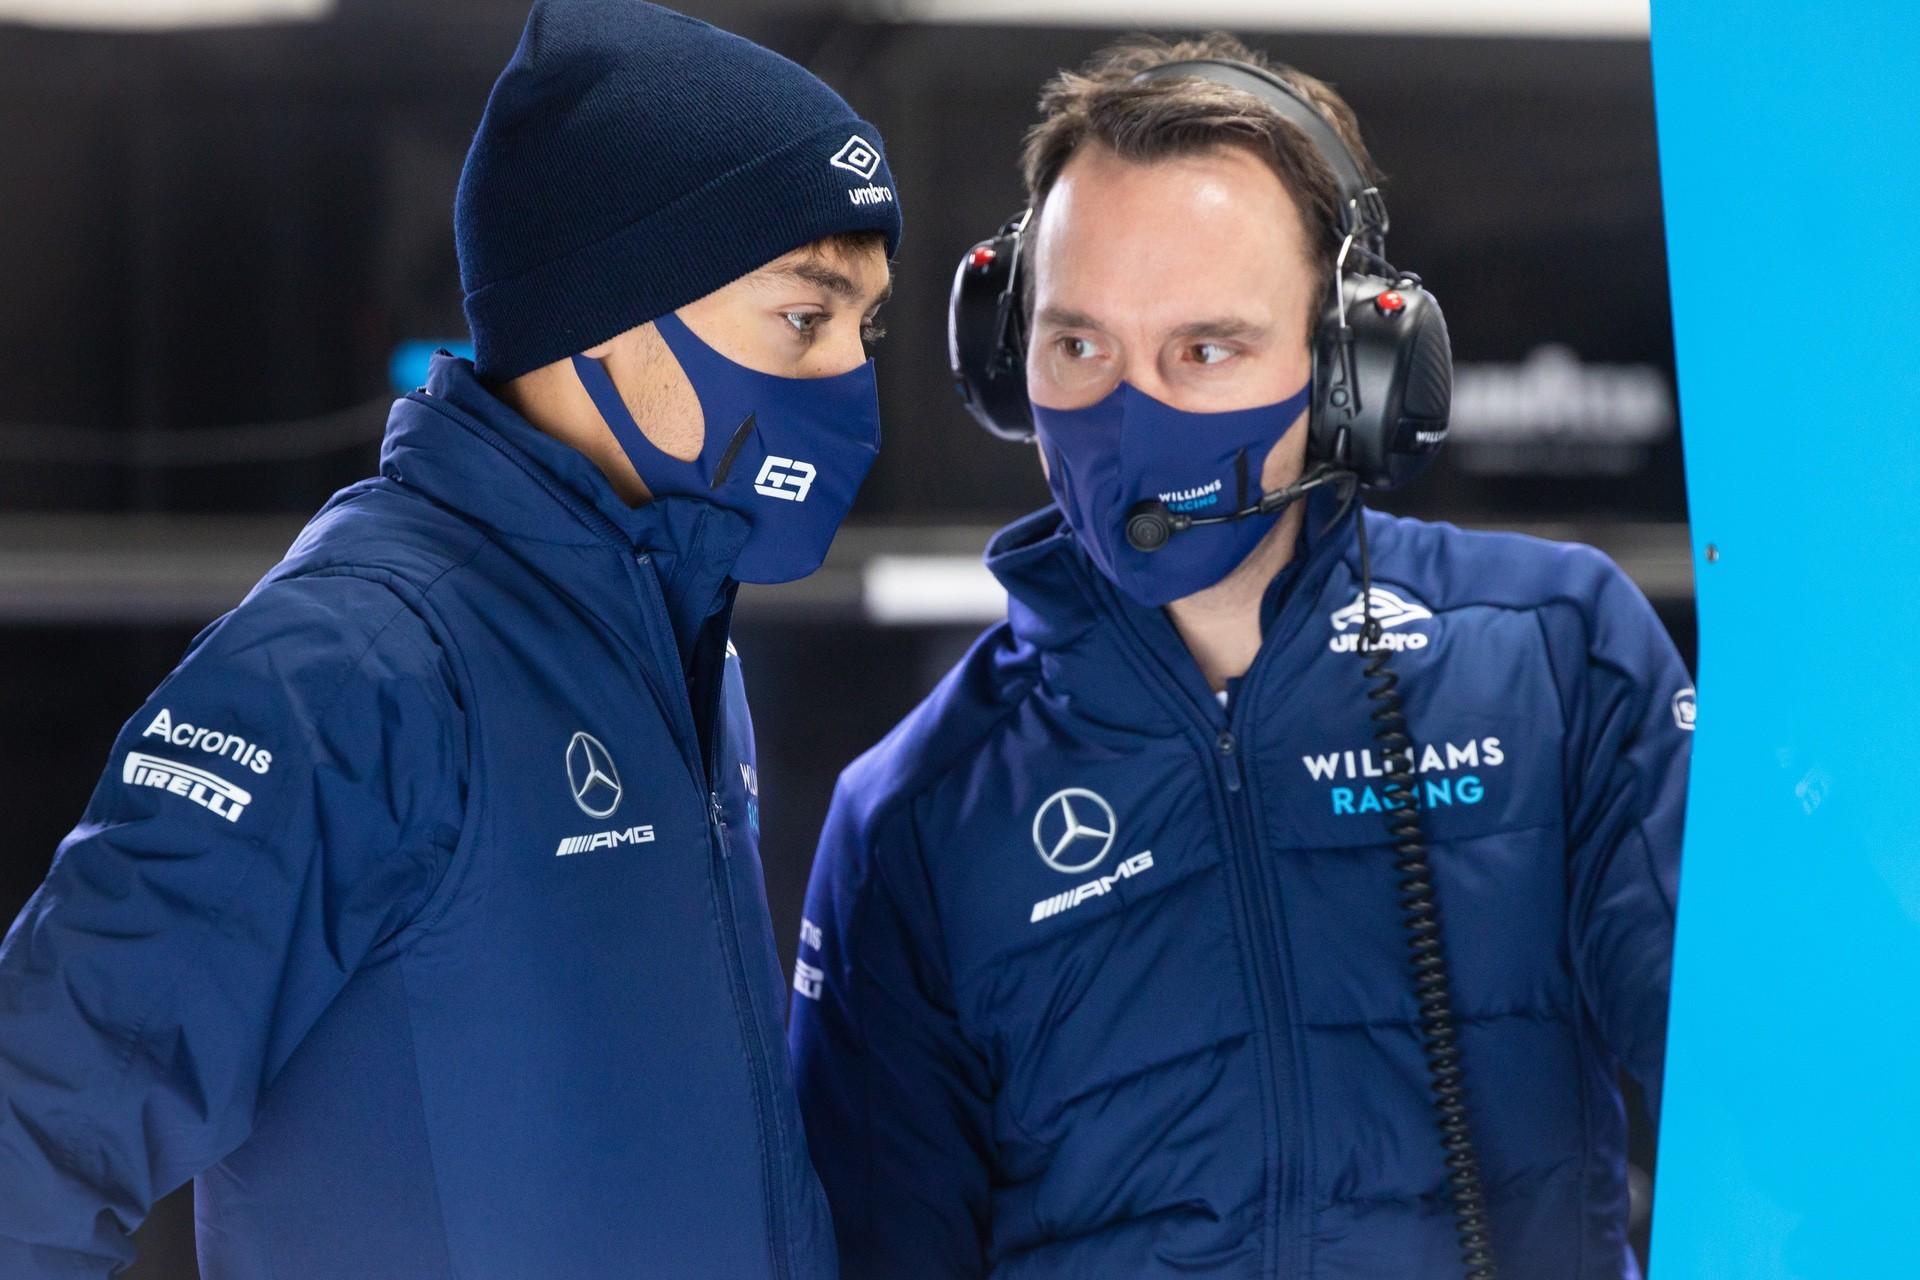 Williams Racing Film Day